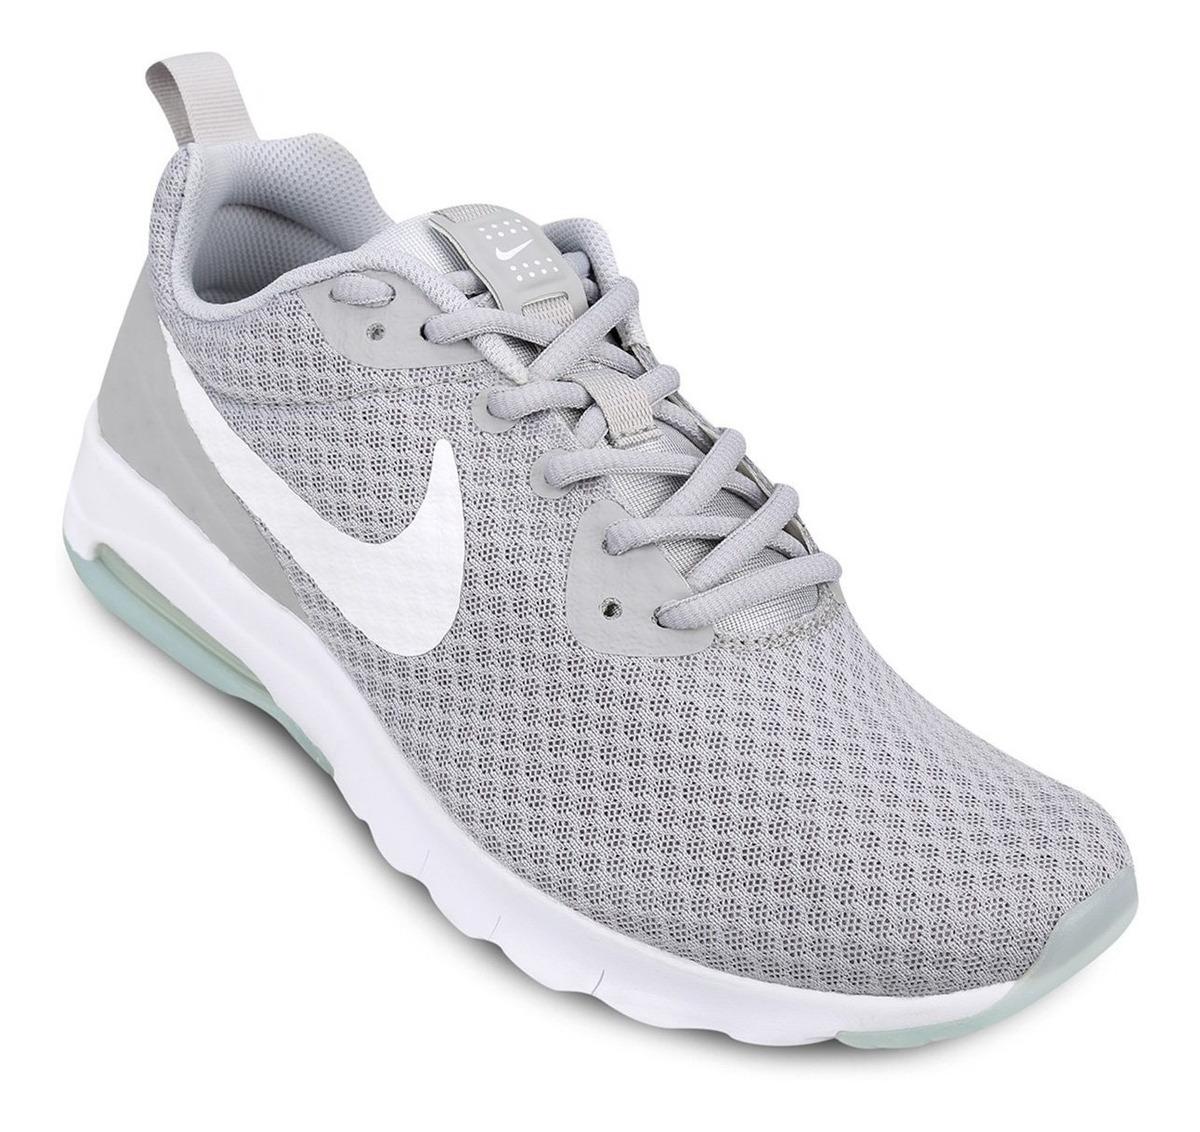 275923d163 zapatillas nike hombre urbana air max motion 2